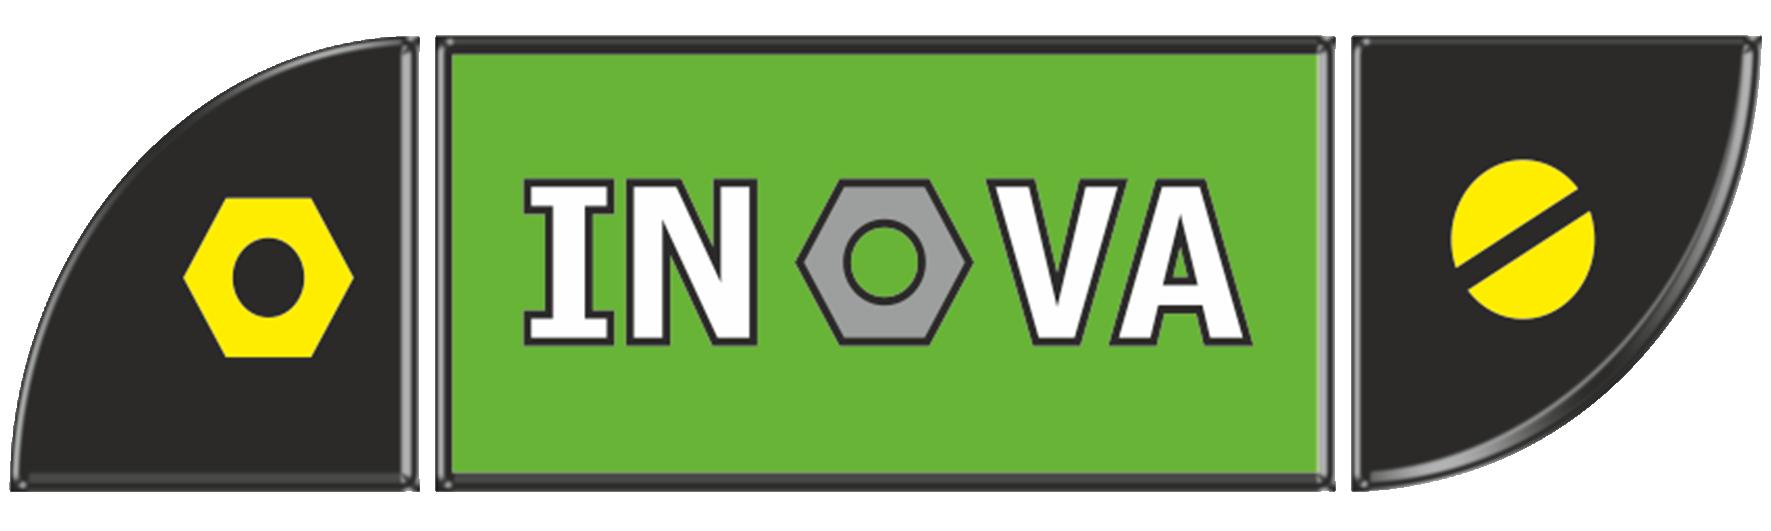 INOVAGmbH-Logo